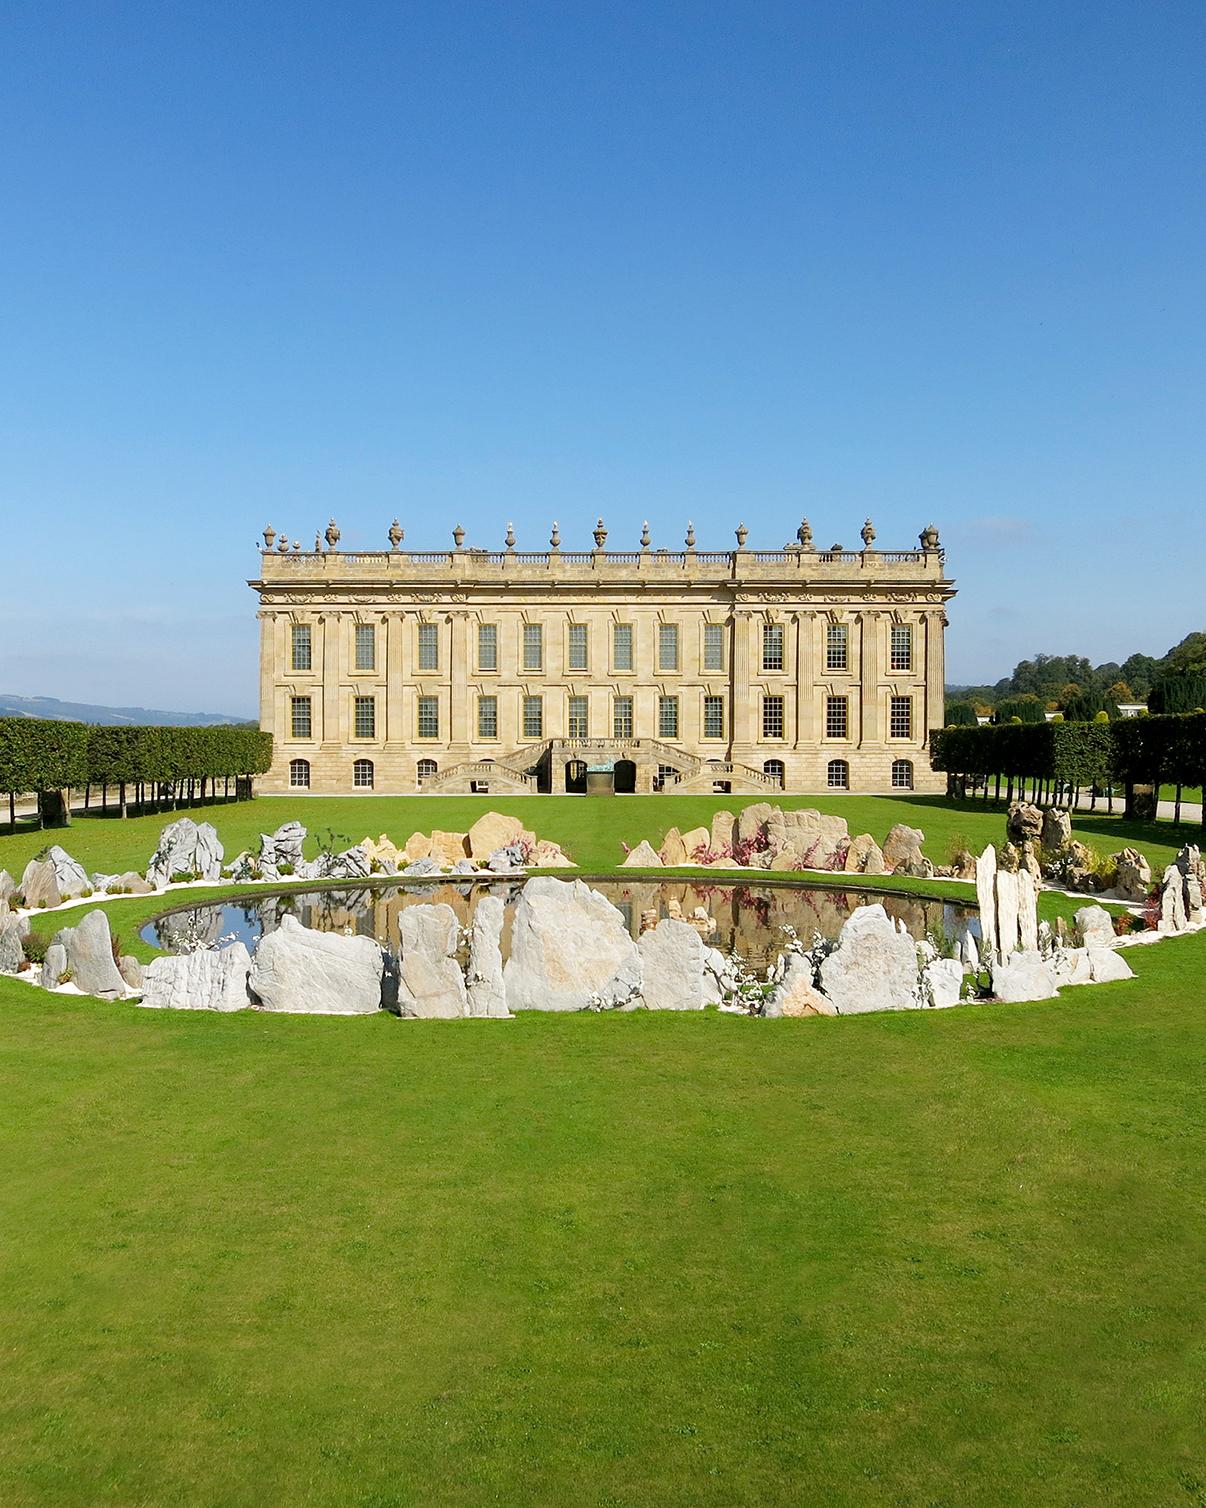 filming-locations-wedding-venues-chatsworth-house-pride-prejudice-0215.jpg